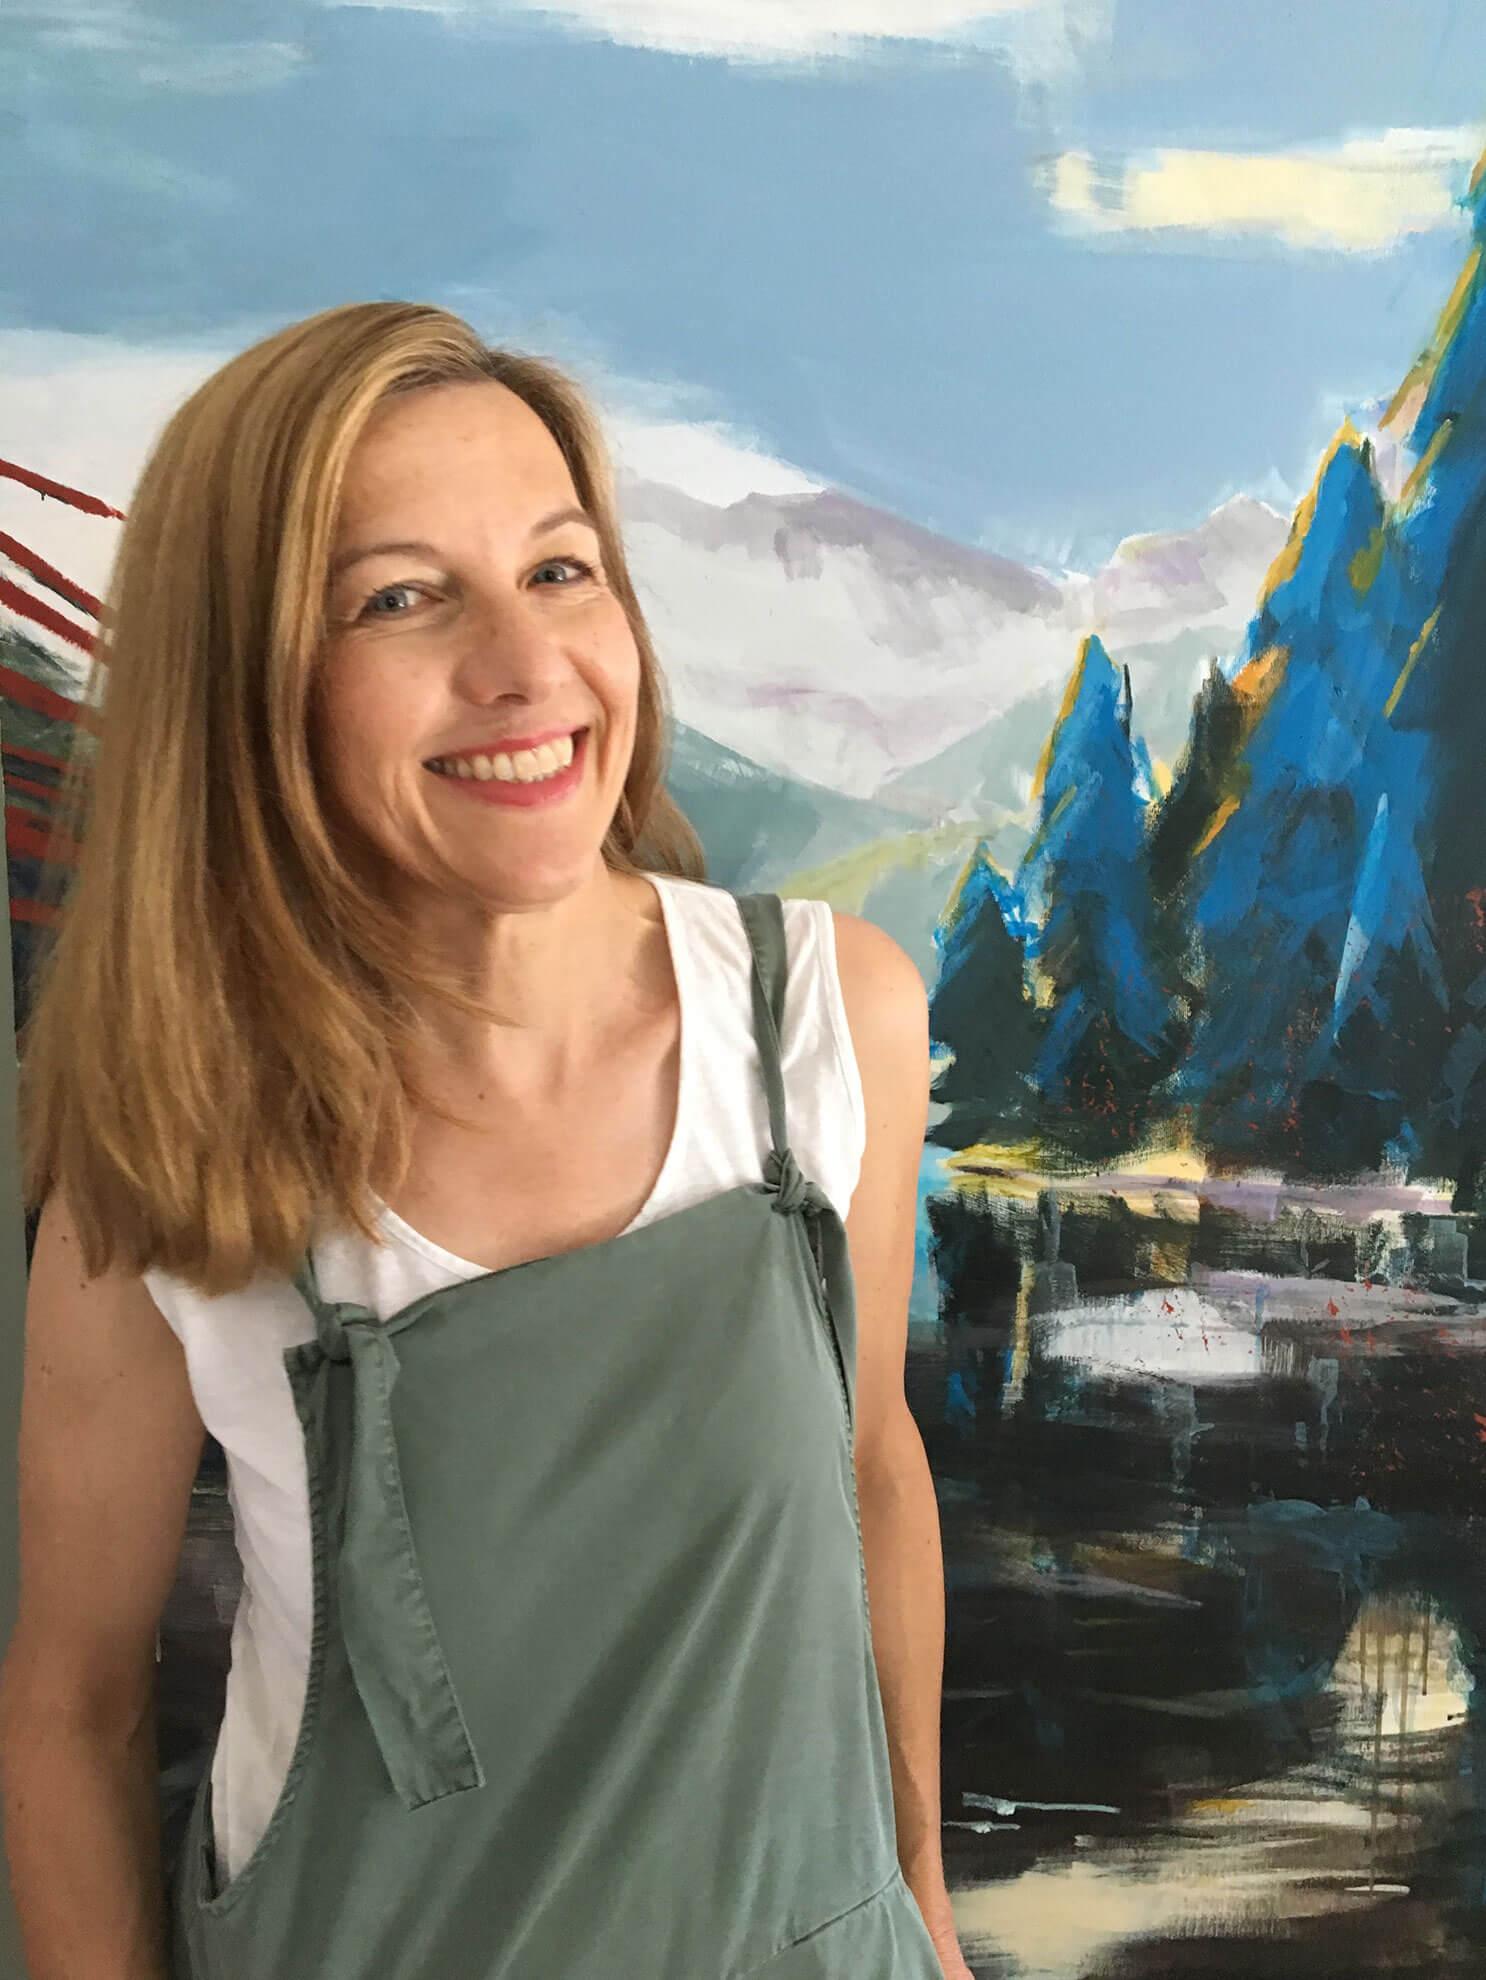 Stadtmalerin Annette Girke, Kunstwerk des Monats März, 2020